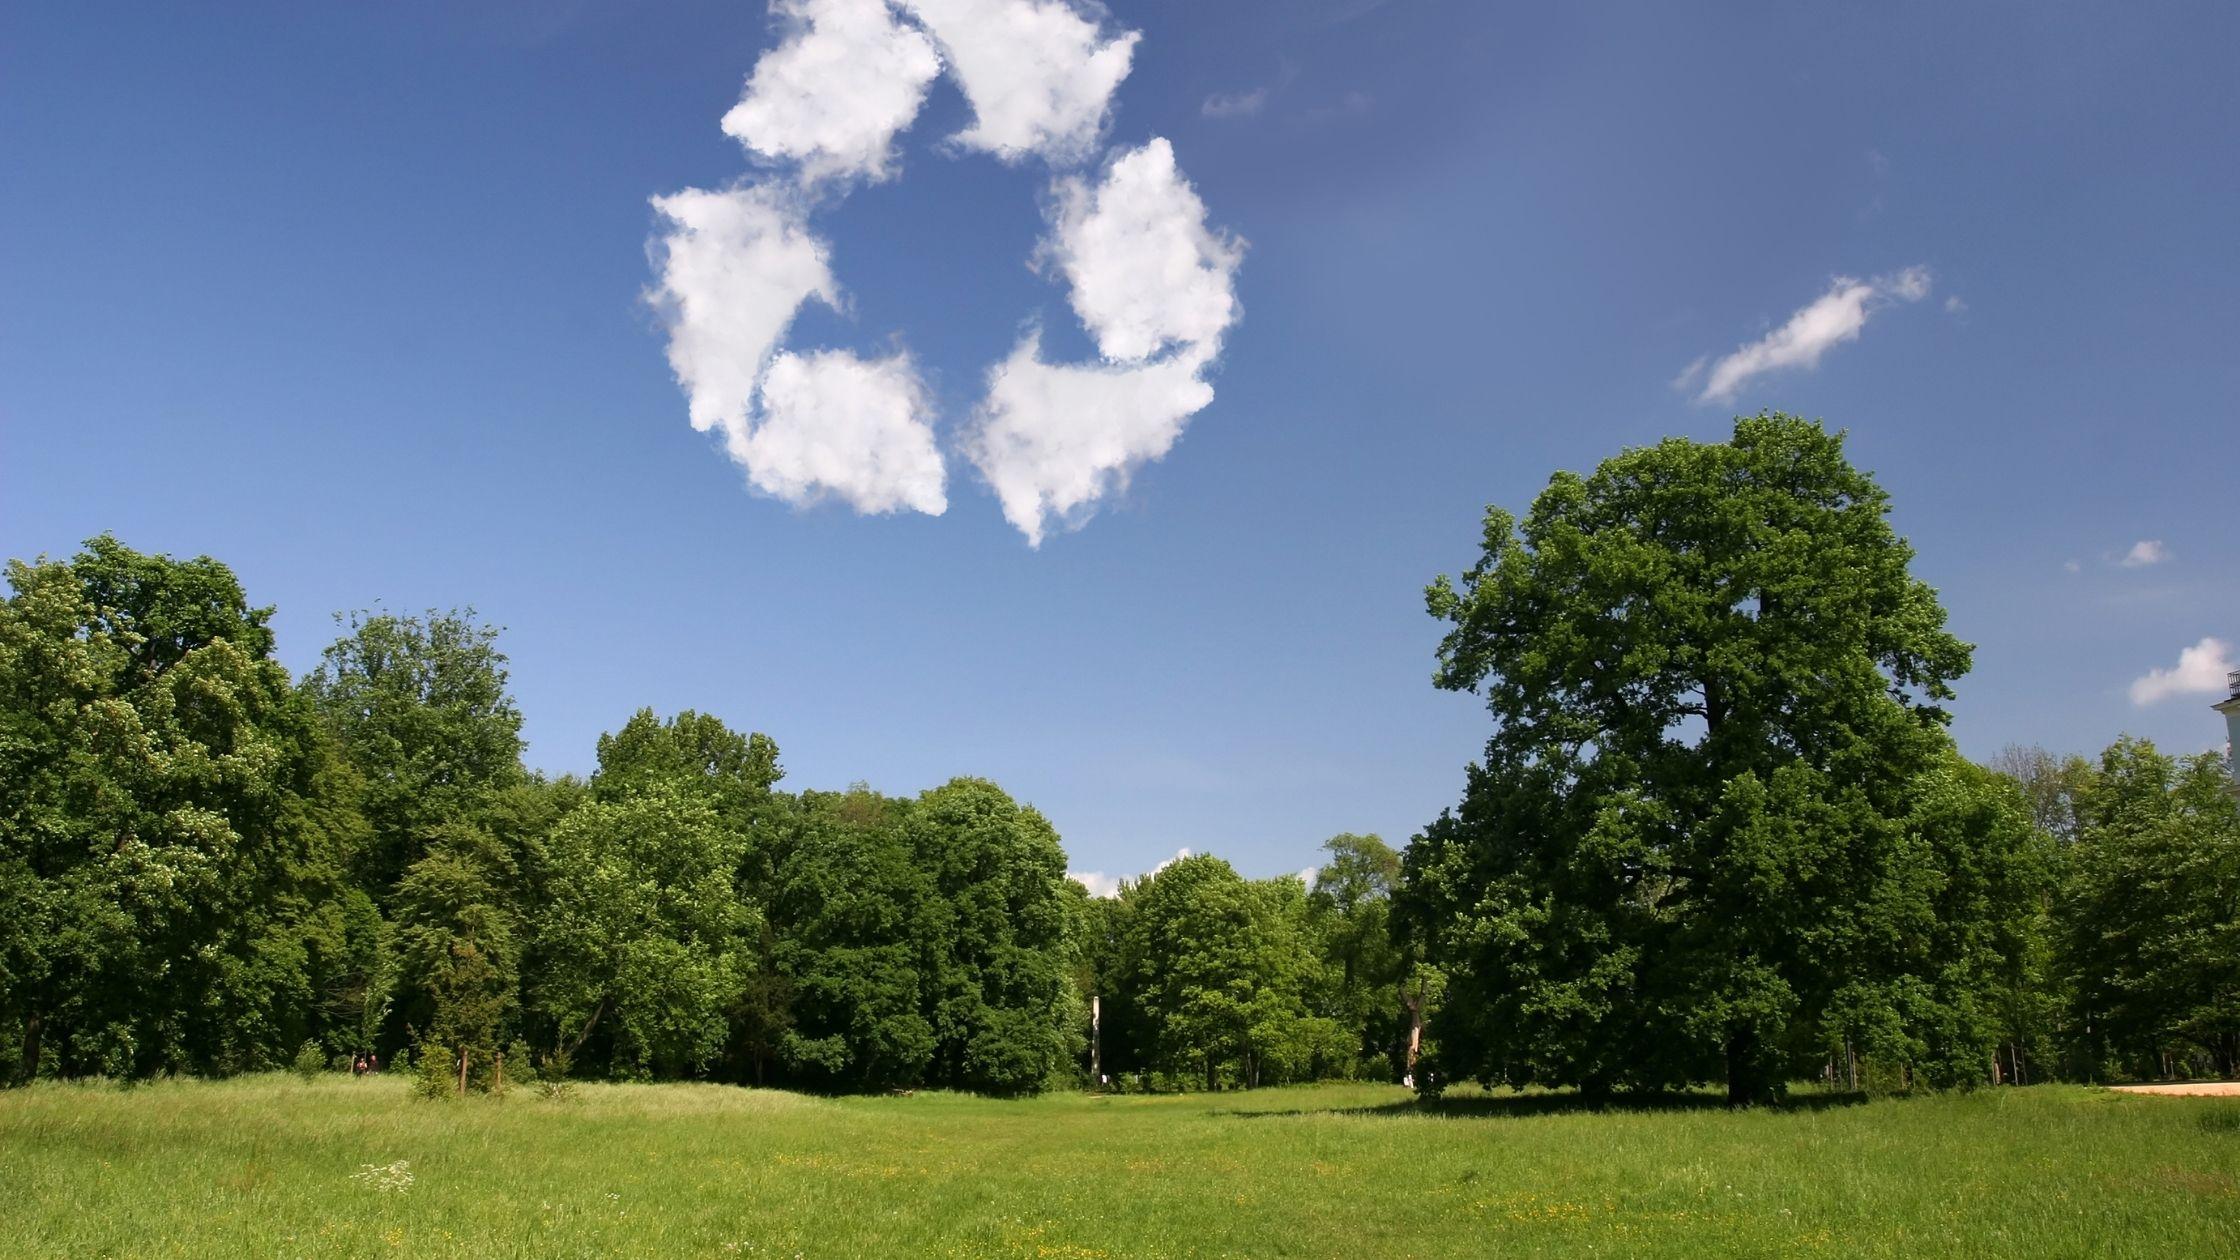 renewable energy help the environment